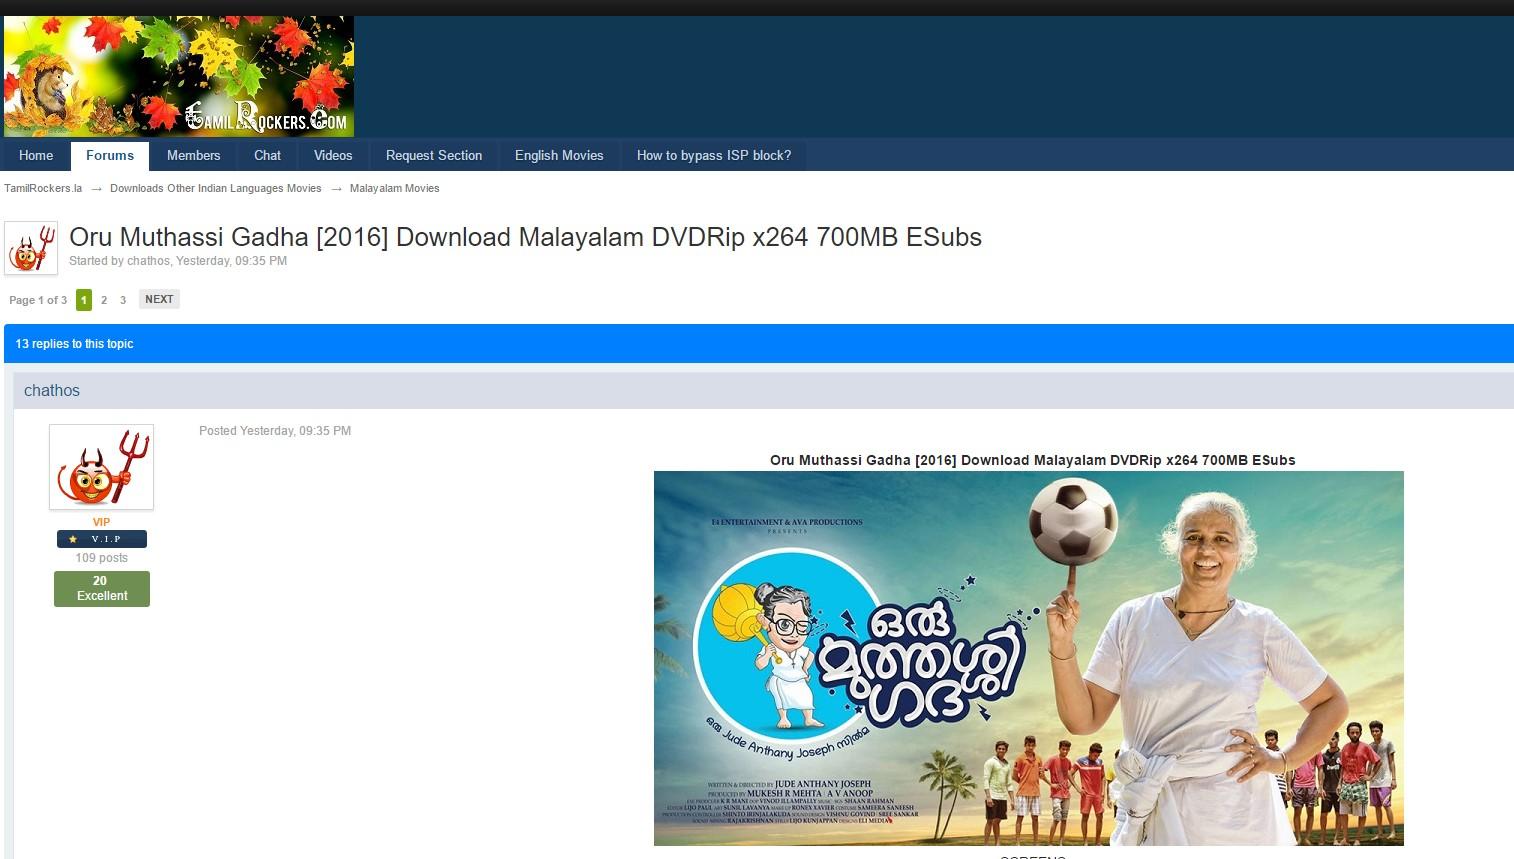 Pulimurugan tamilrockers st | TamilRockers Website: TamilRockers